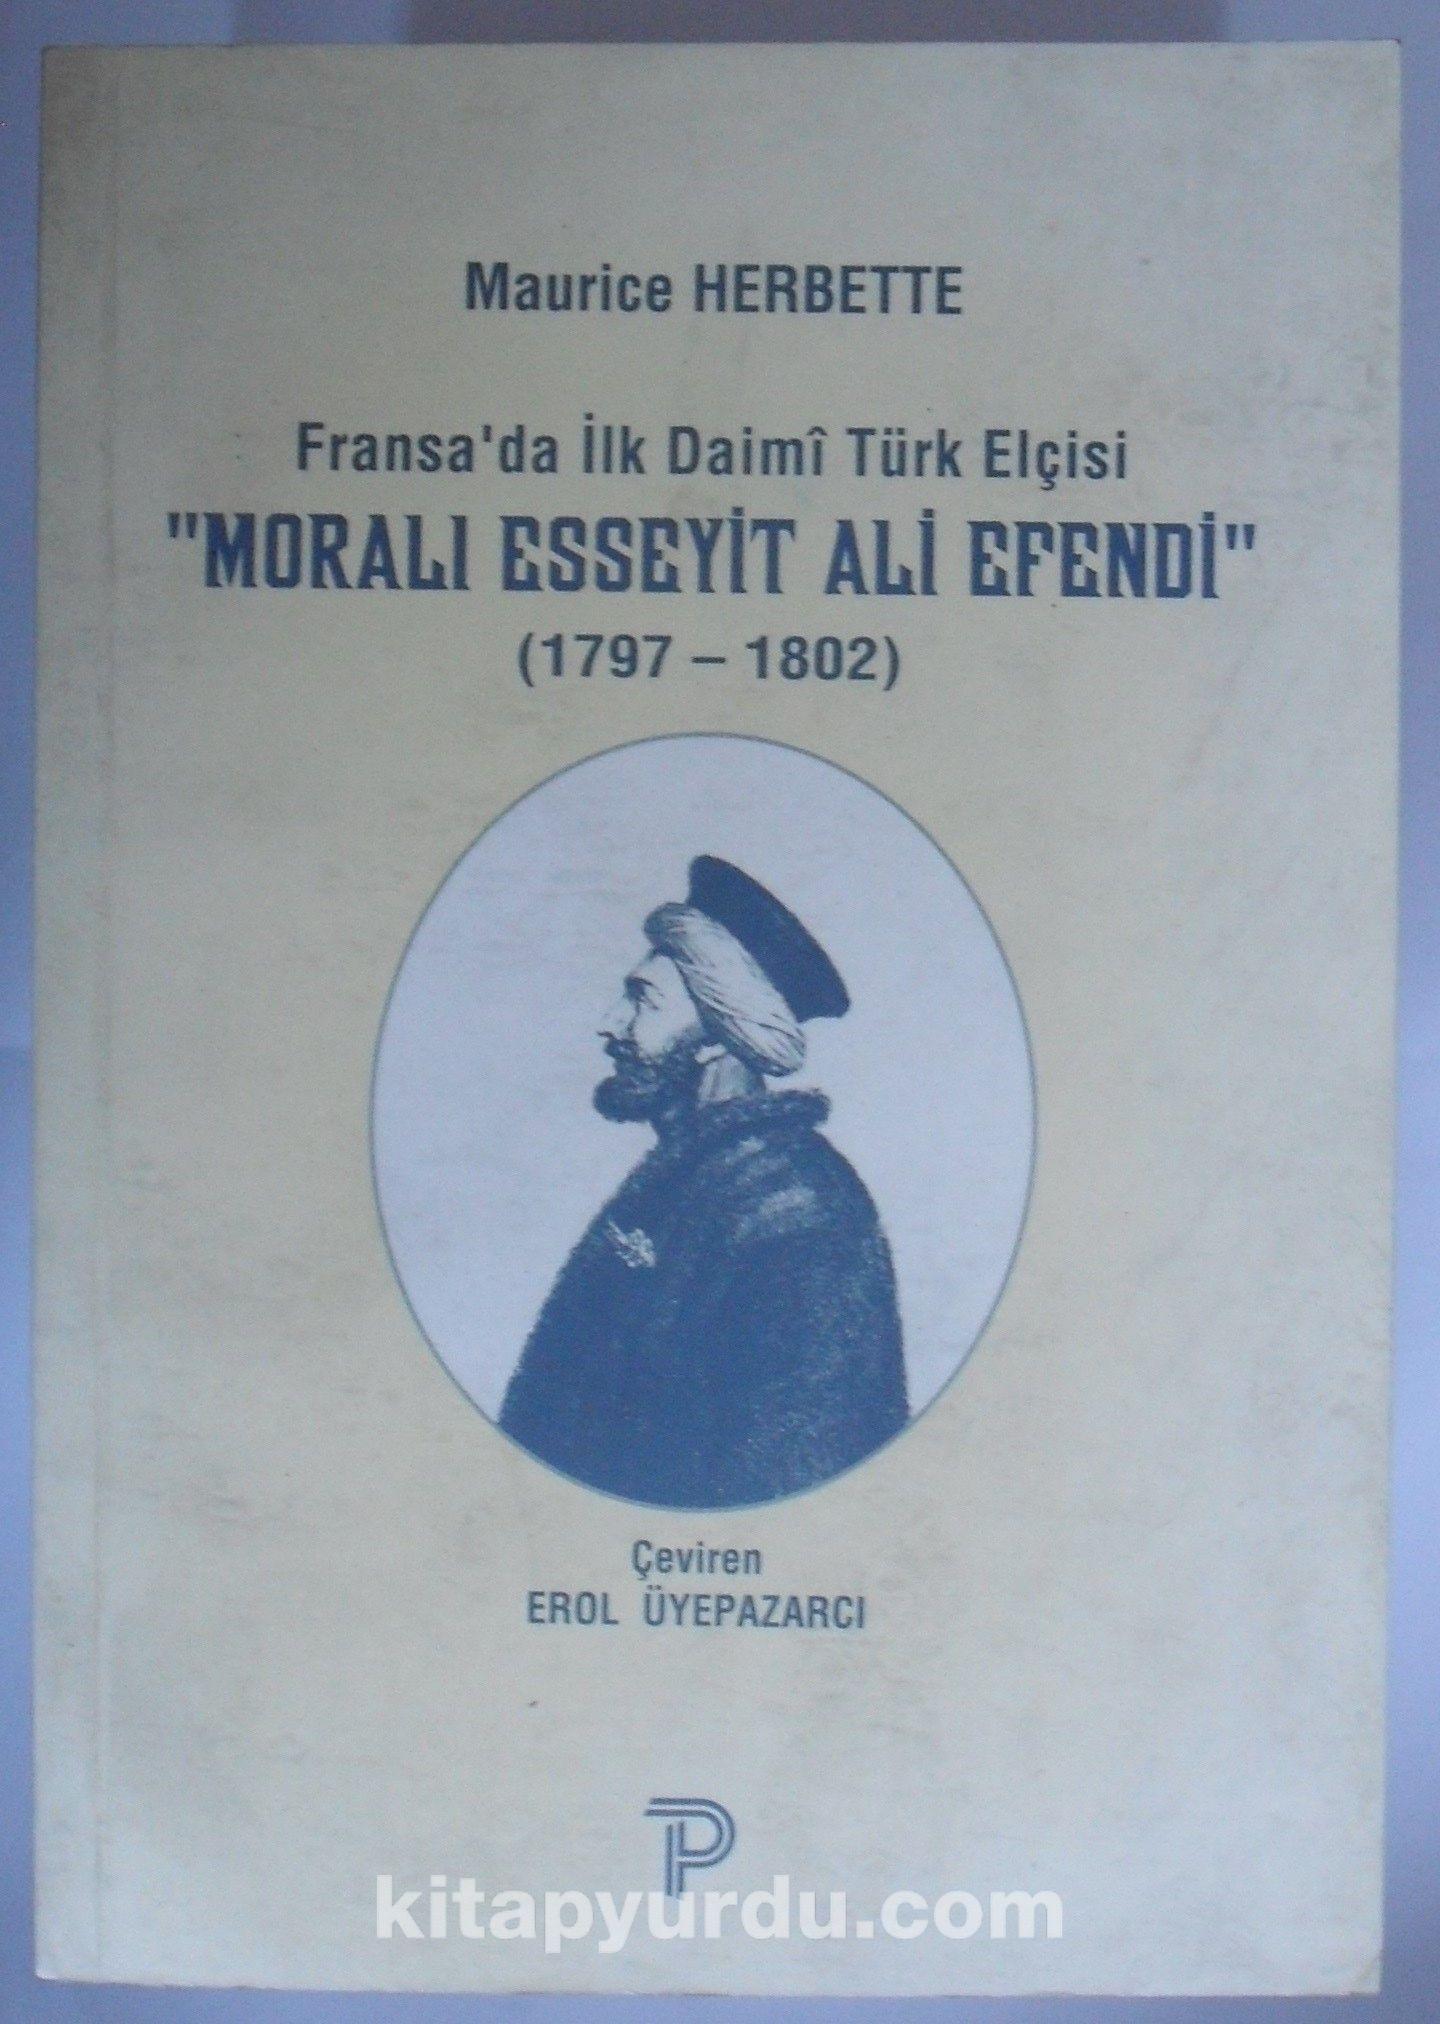 Fransada İlk Daimi Türk Elçisi Moralı Esseyit Ali Efendi (1979-1802) (Kod:6-D-22) - Maurice Herbette pdf epub